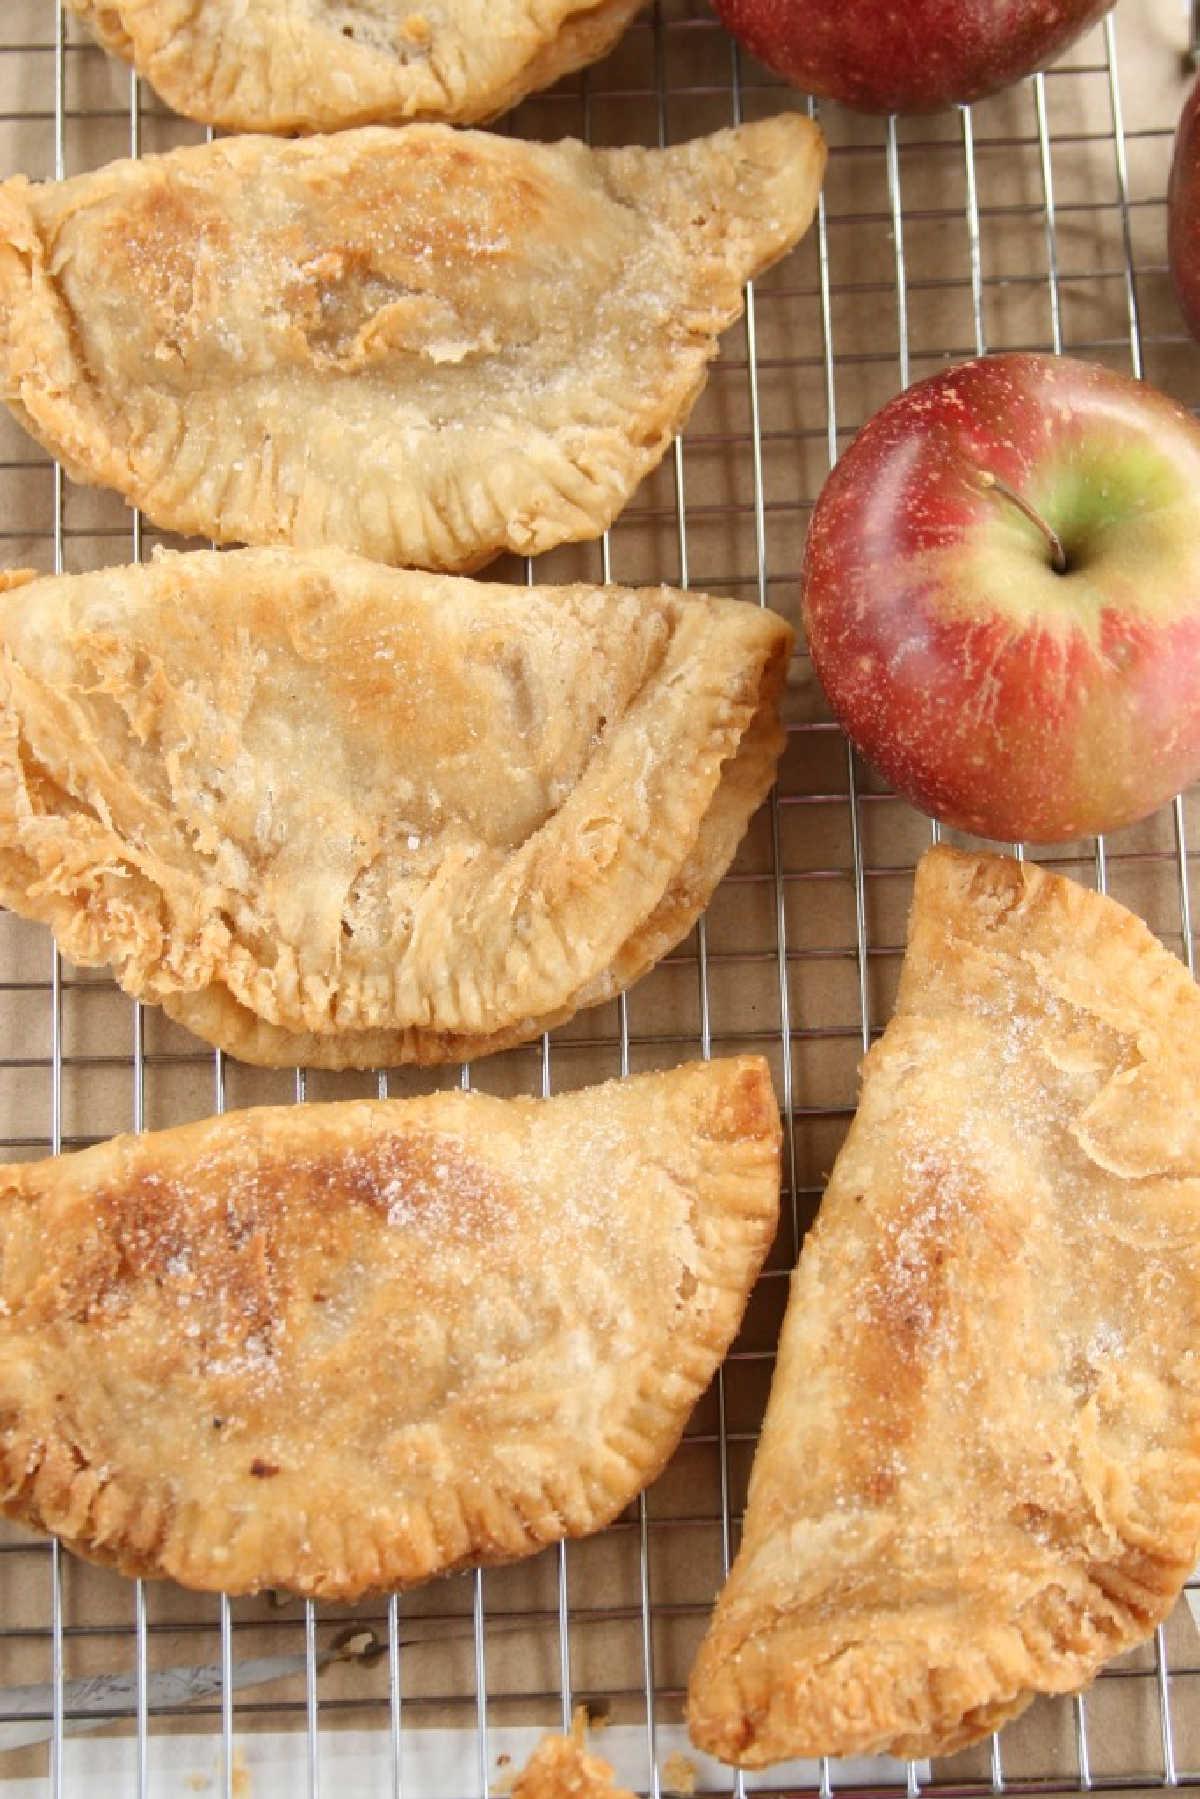 Apple hand pies cooling on metal baking rack. McIntosh apples on rack.